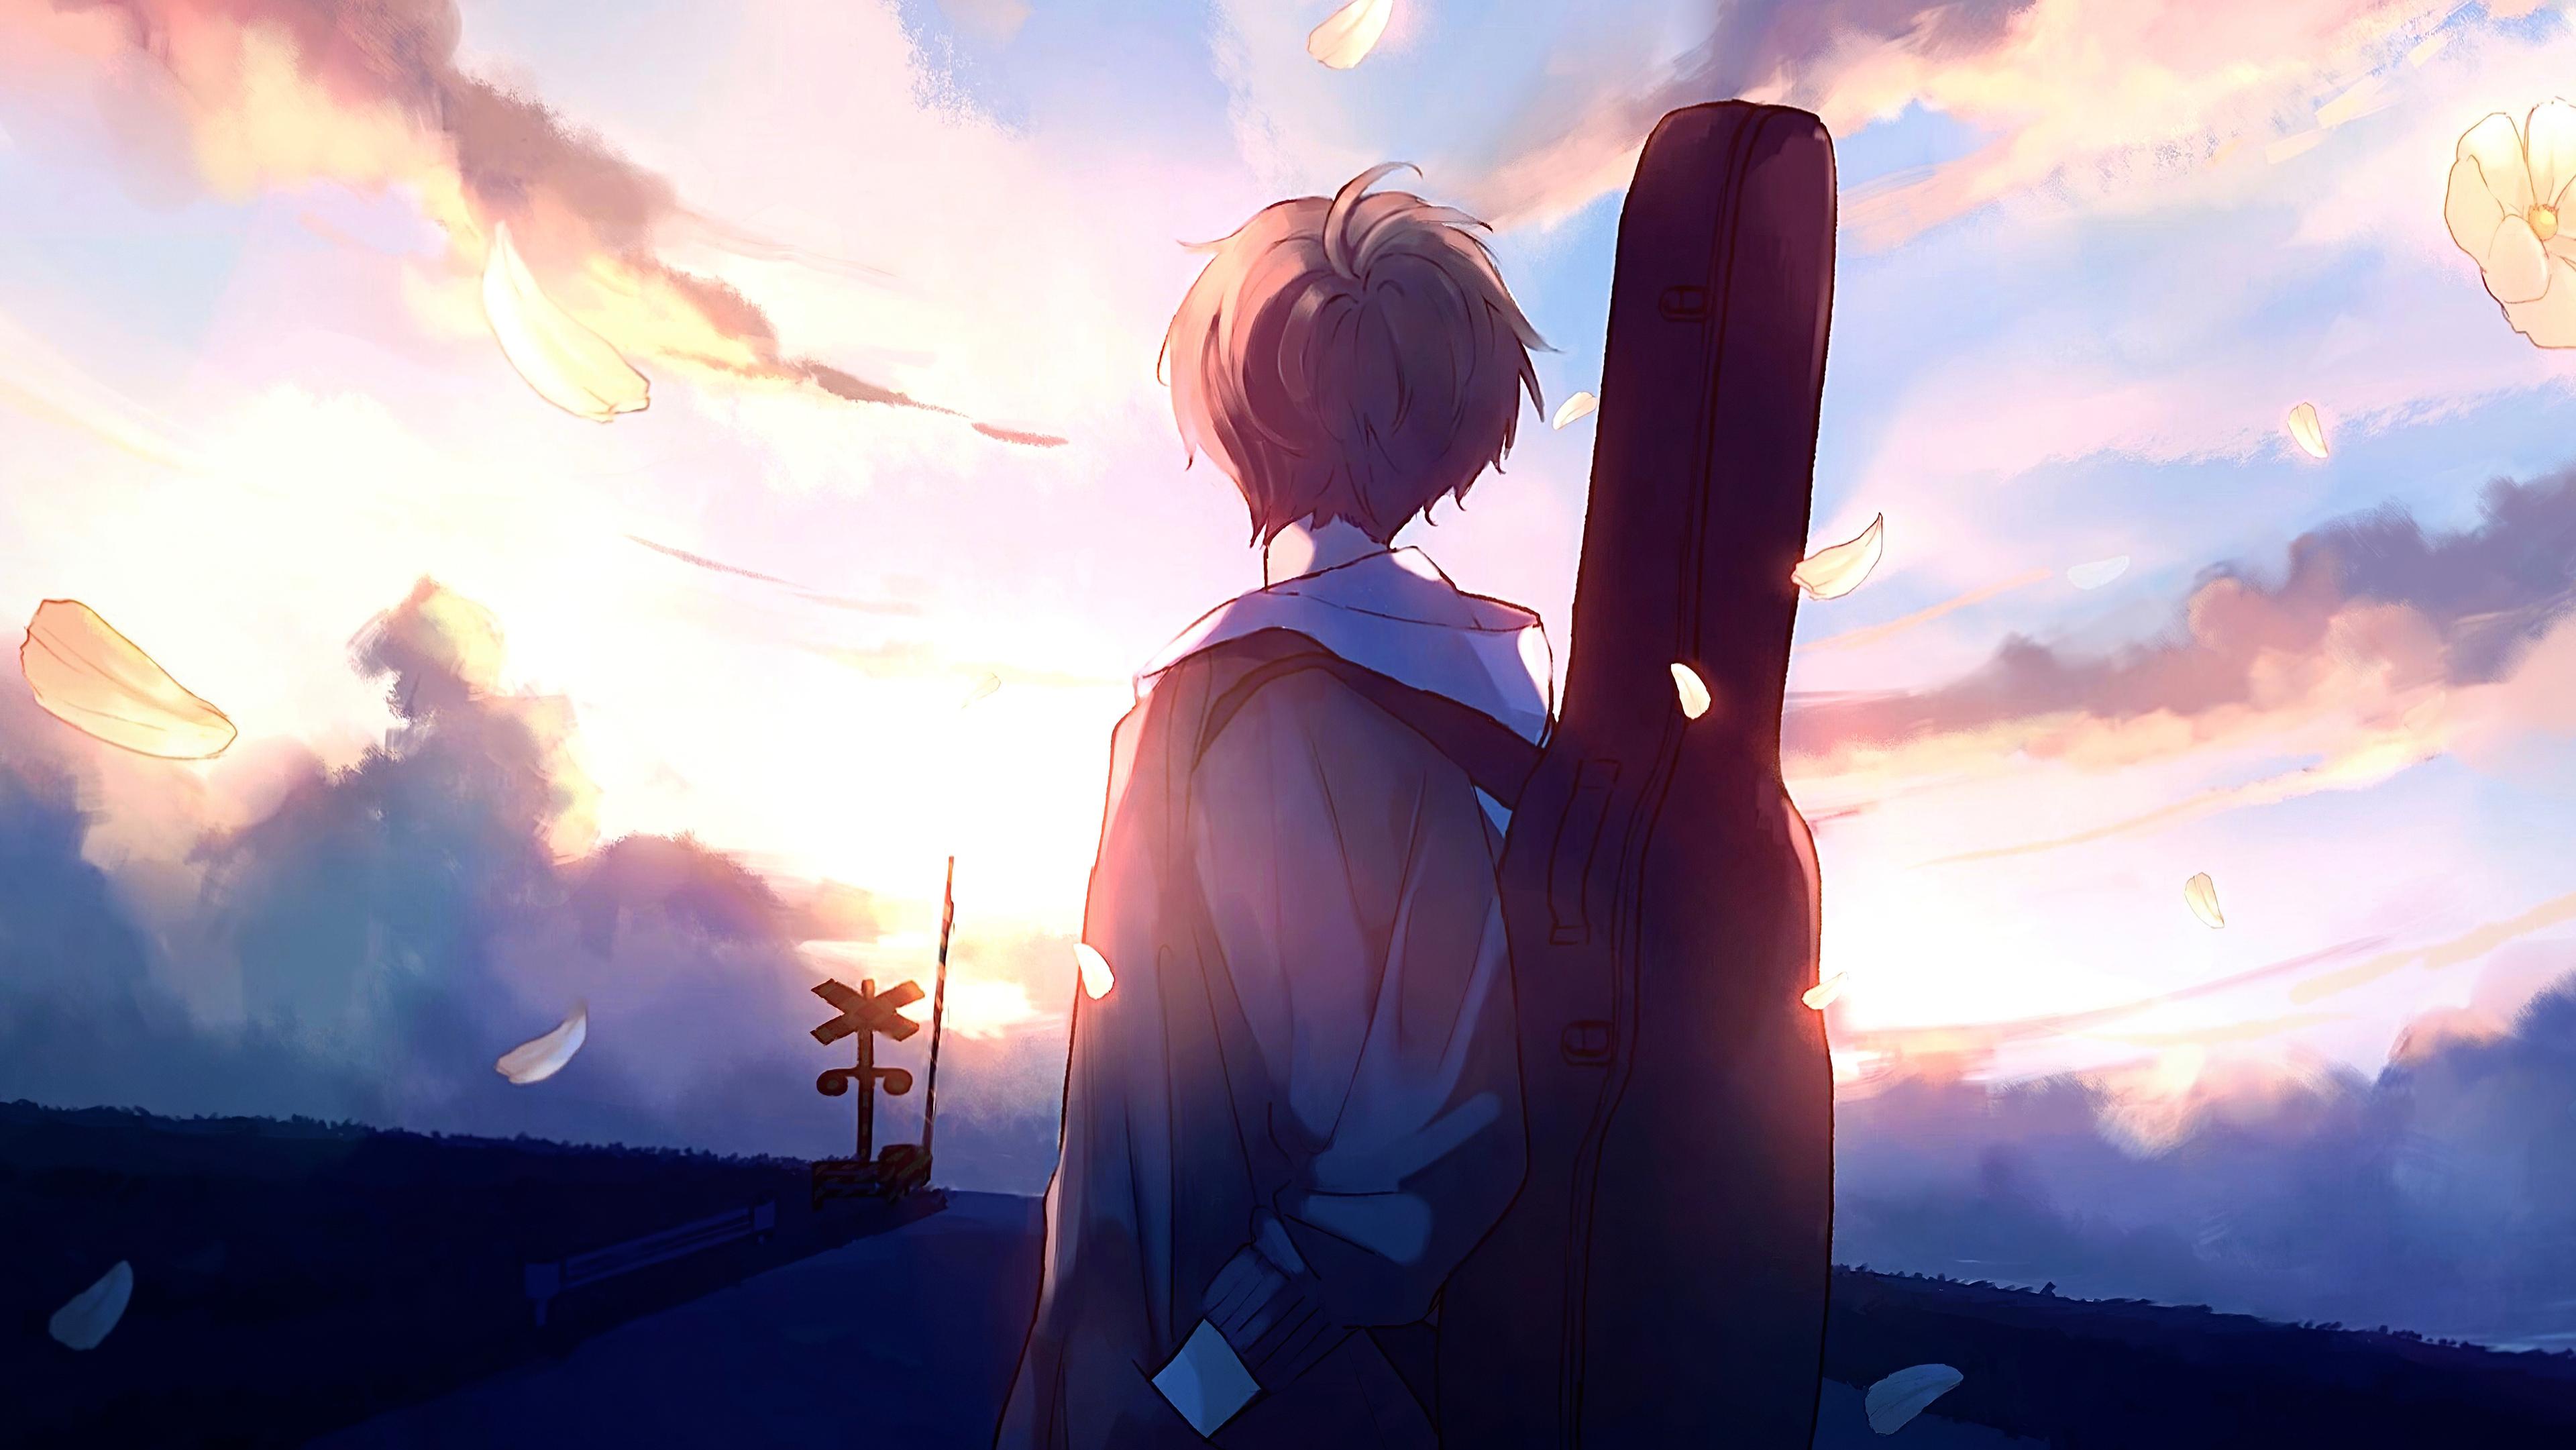 anime boy guitar painting 1578254418 - Anime Boy Guitar Painting -